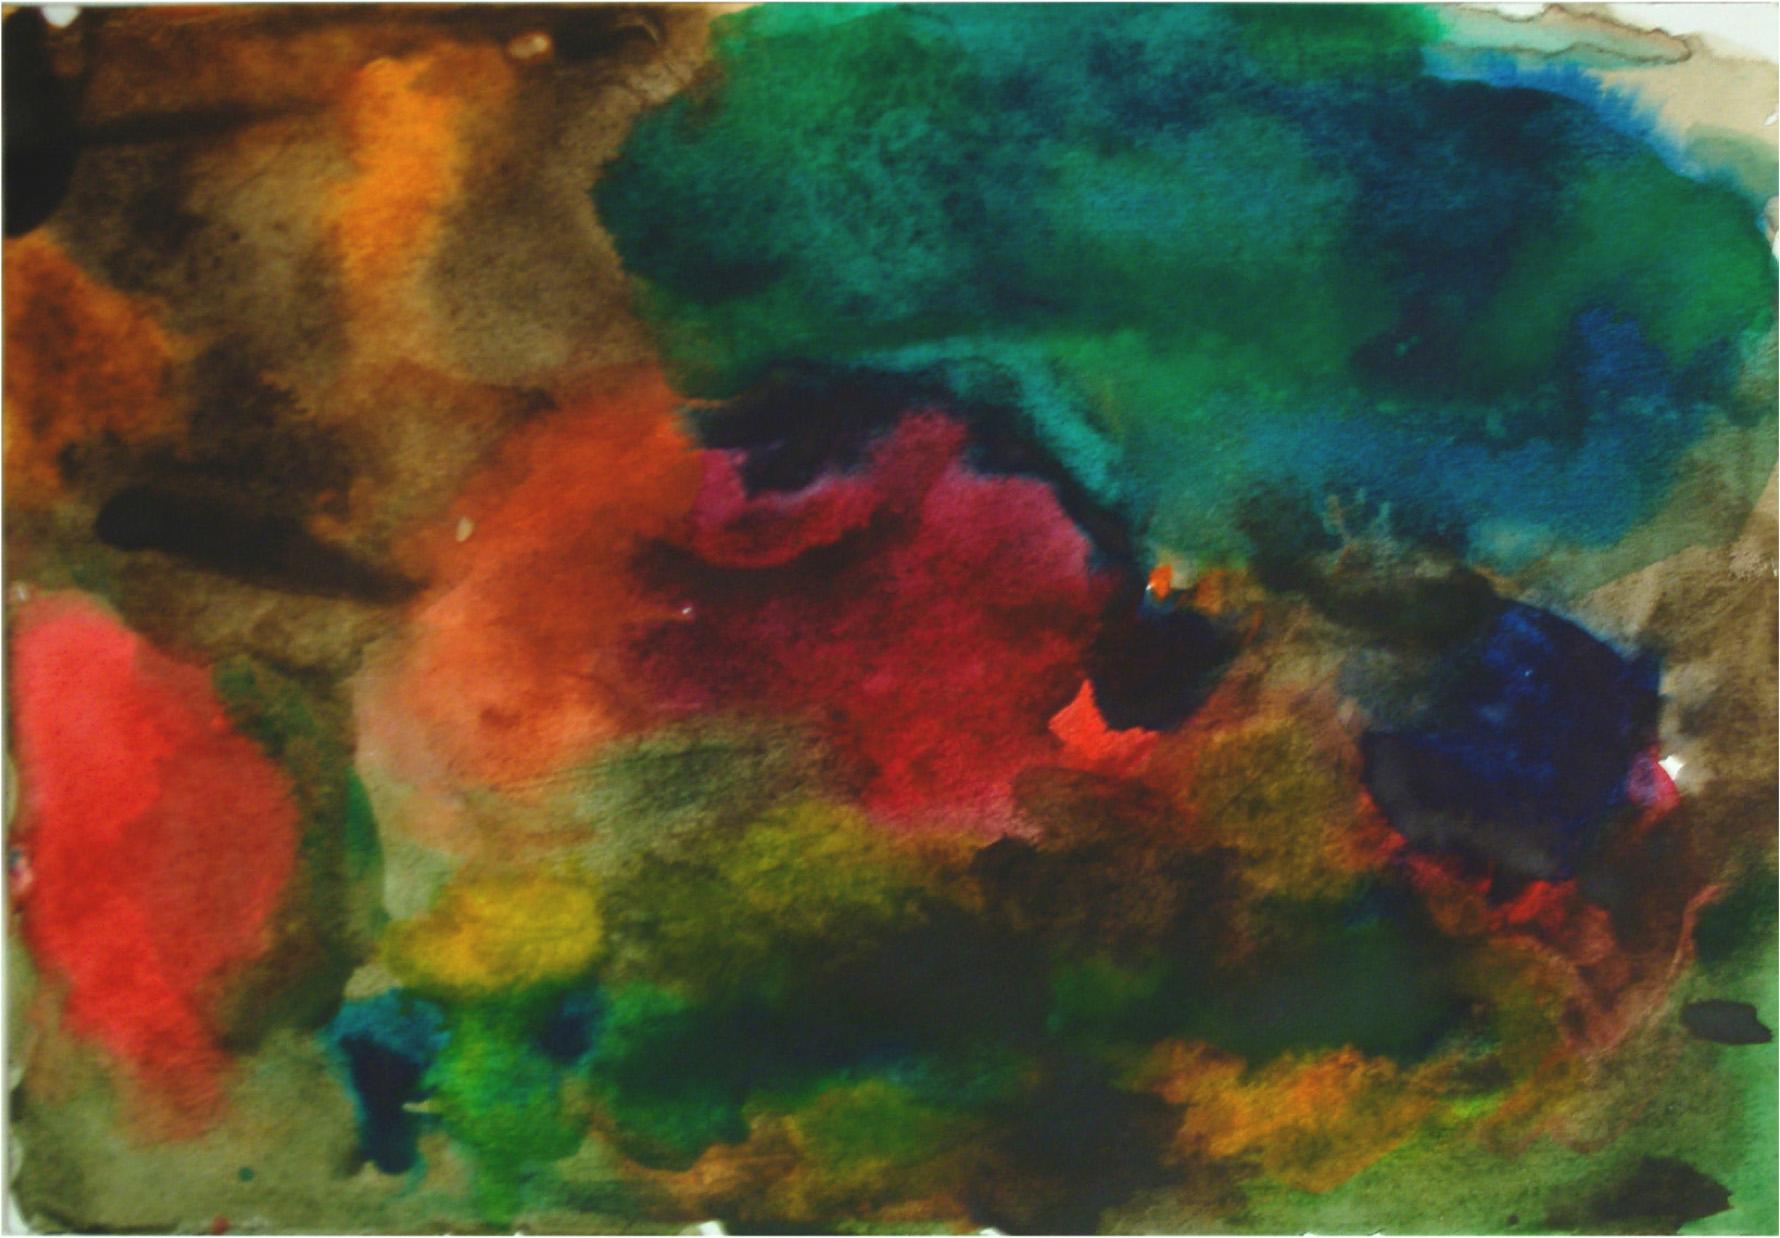 Paul_Melzer_Art_Painting4_klein